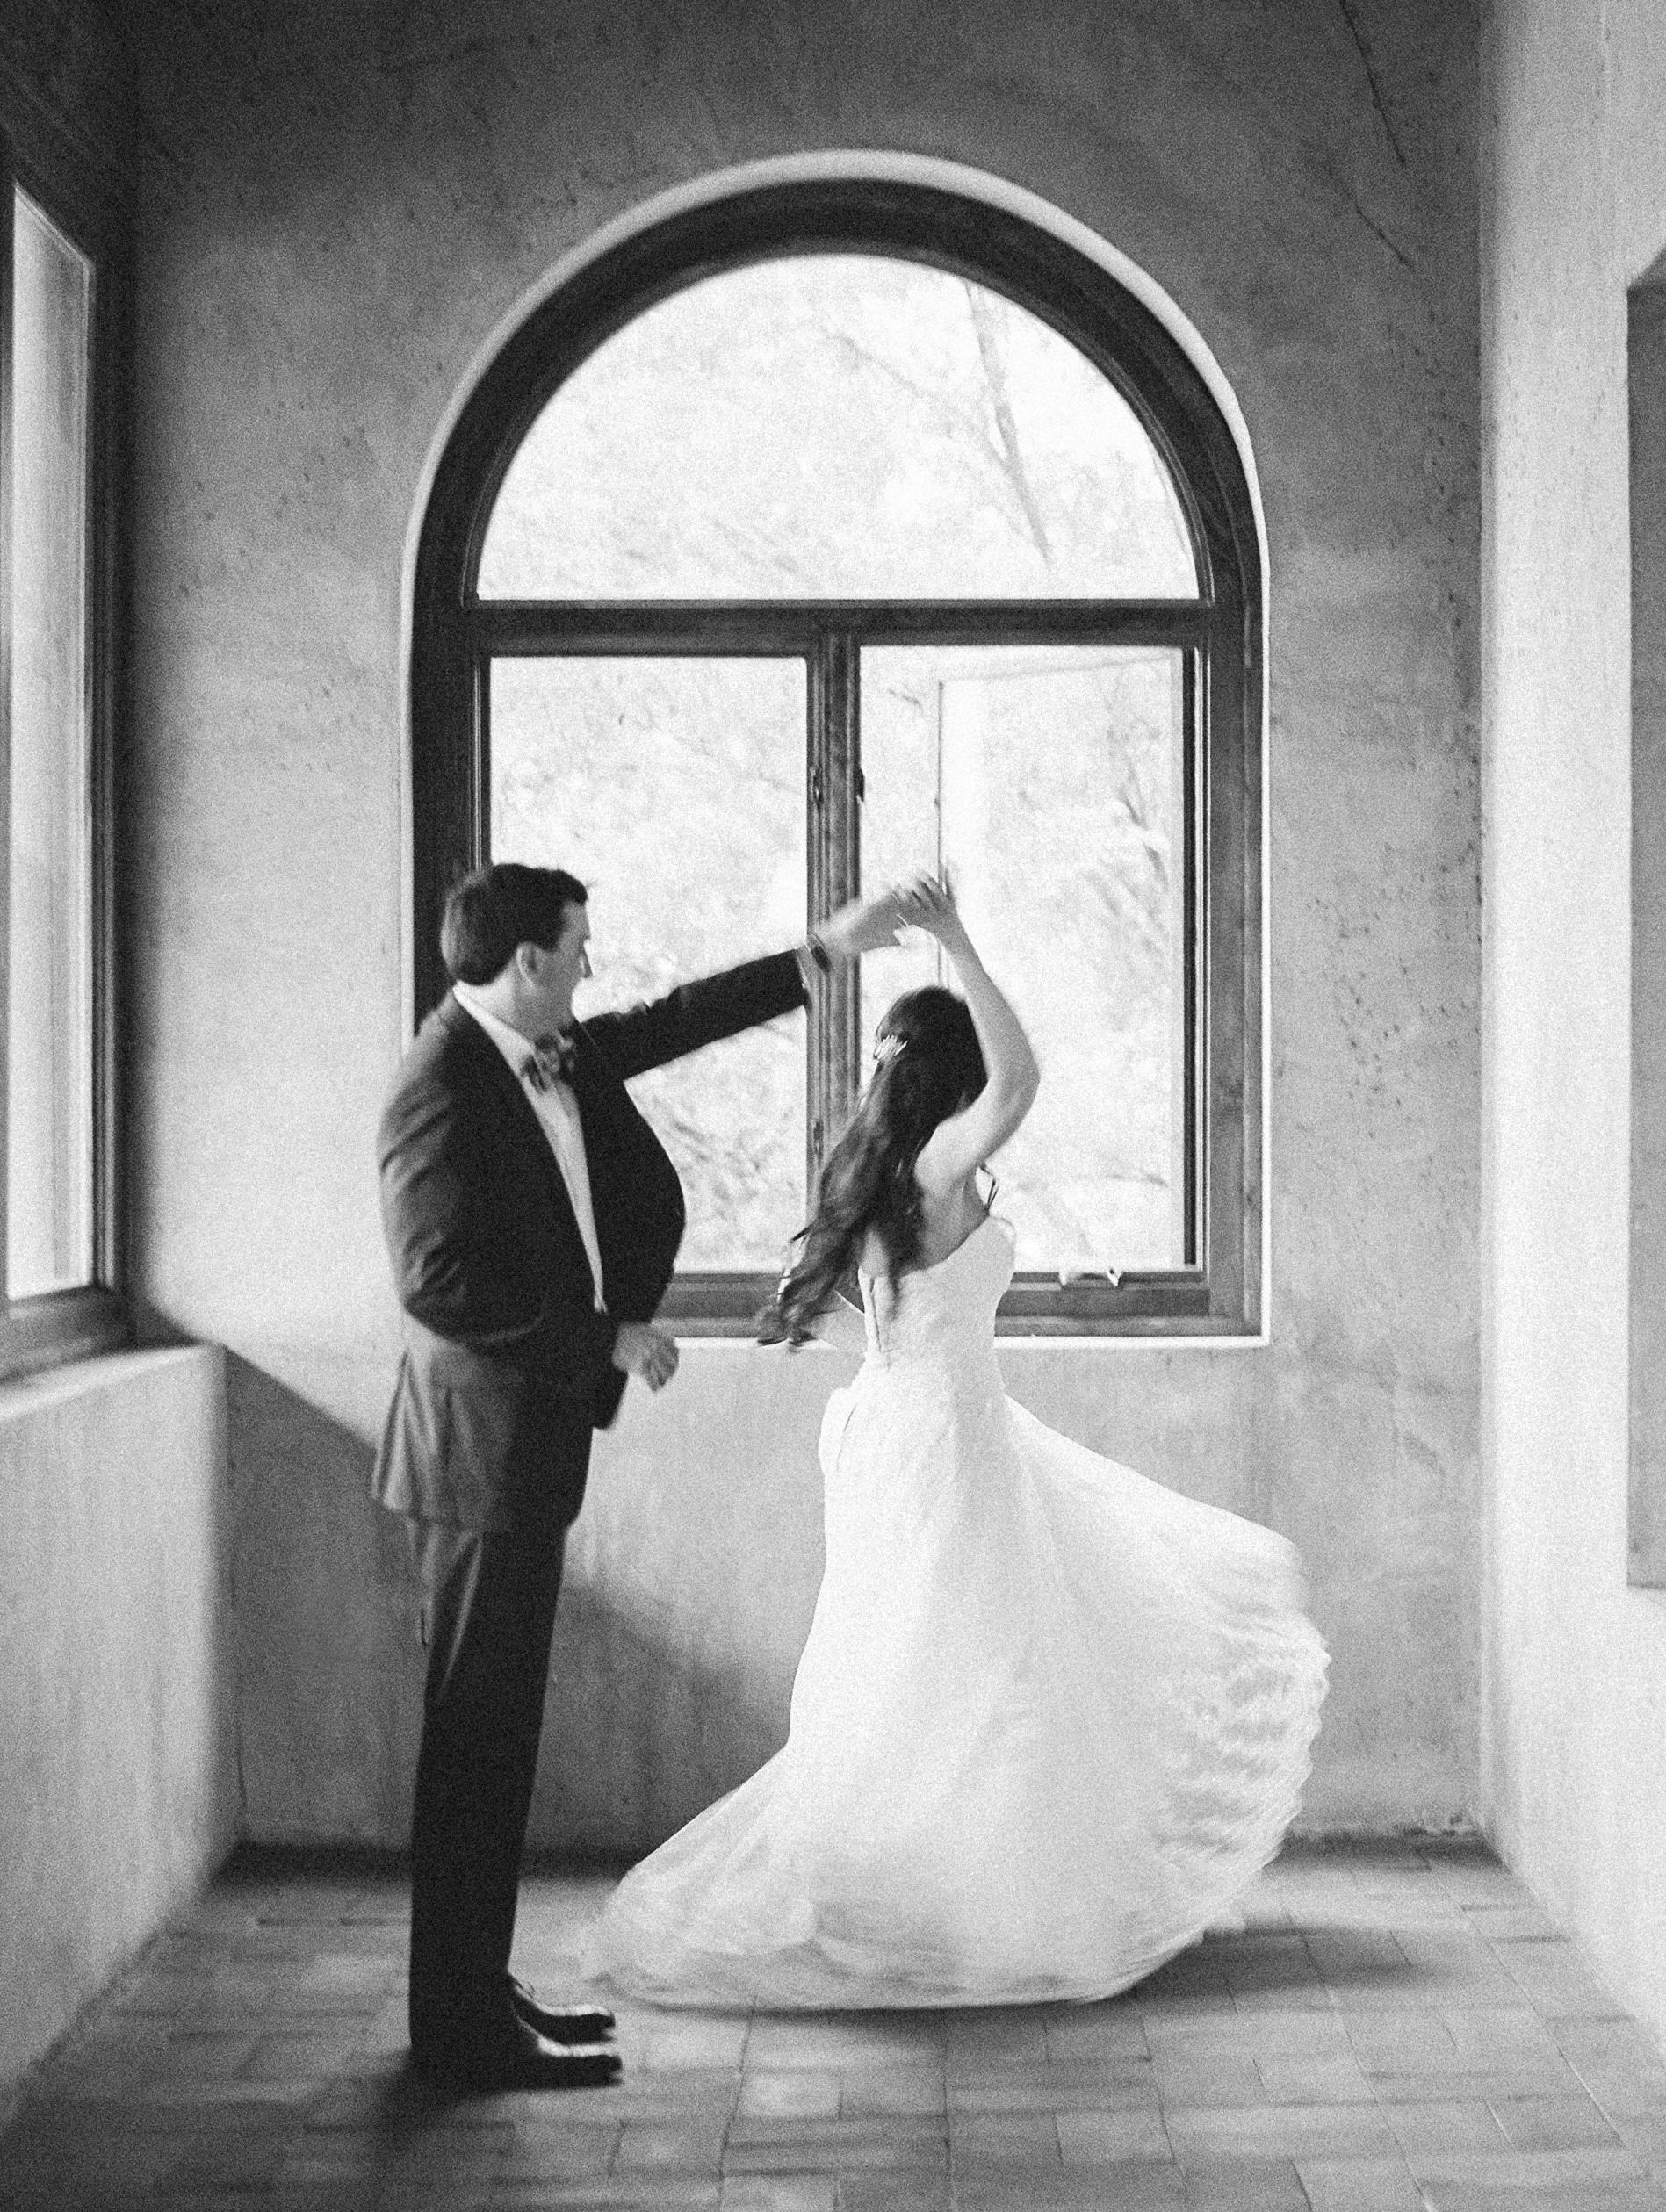 Romantic-Summerour-studio-wedding-hannah-forsberg-atlanta-wedding-photographer56.JPG